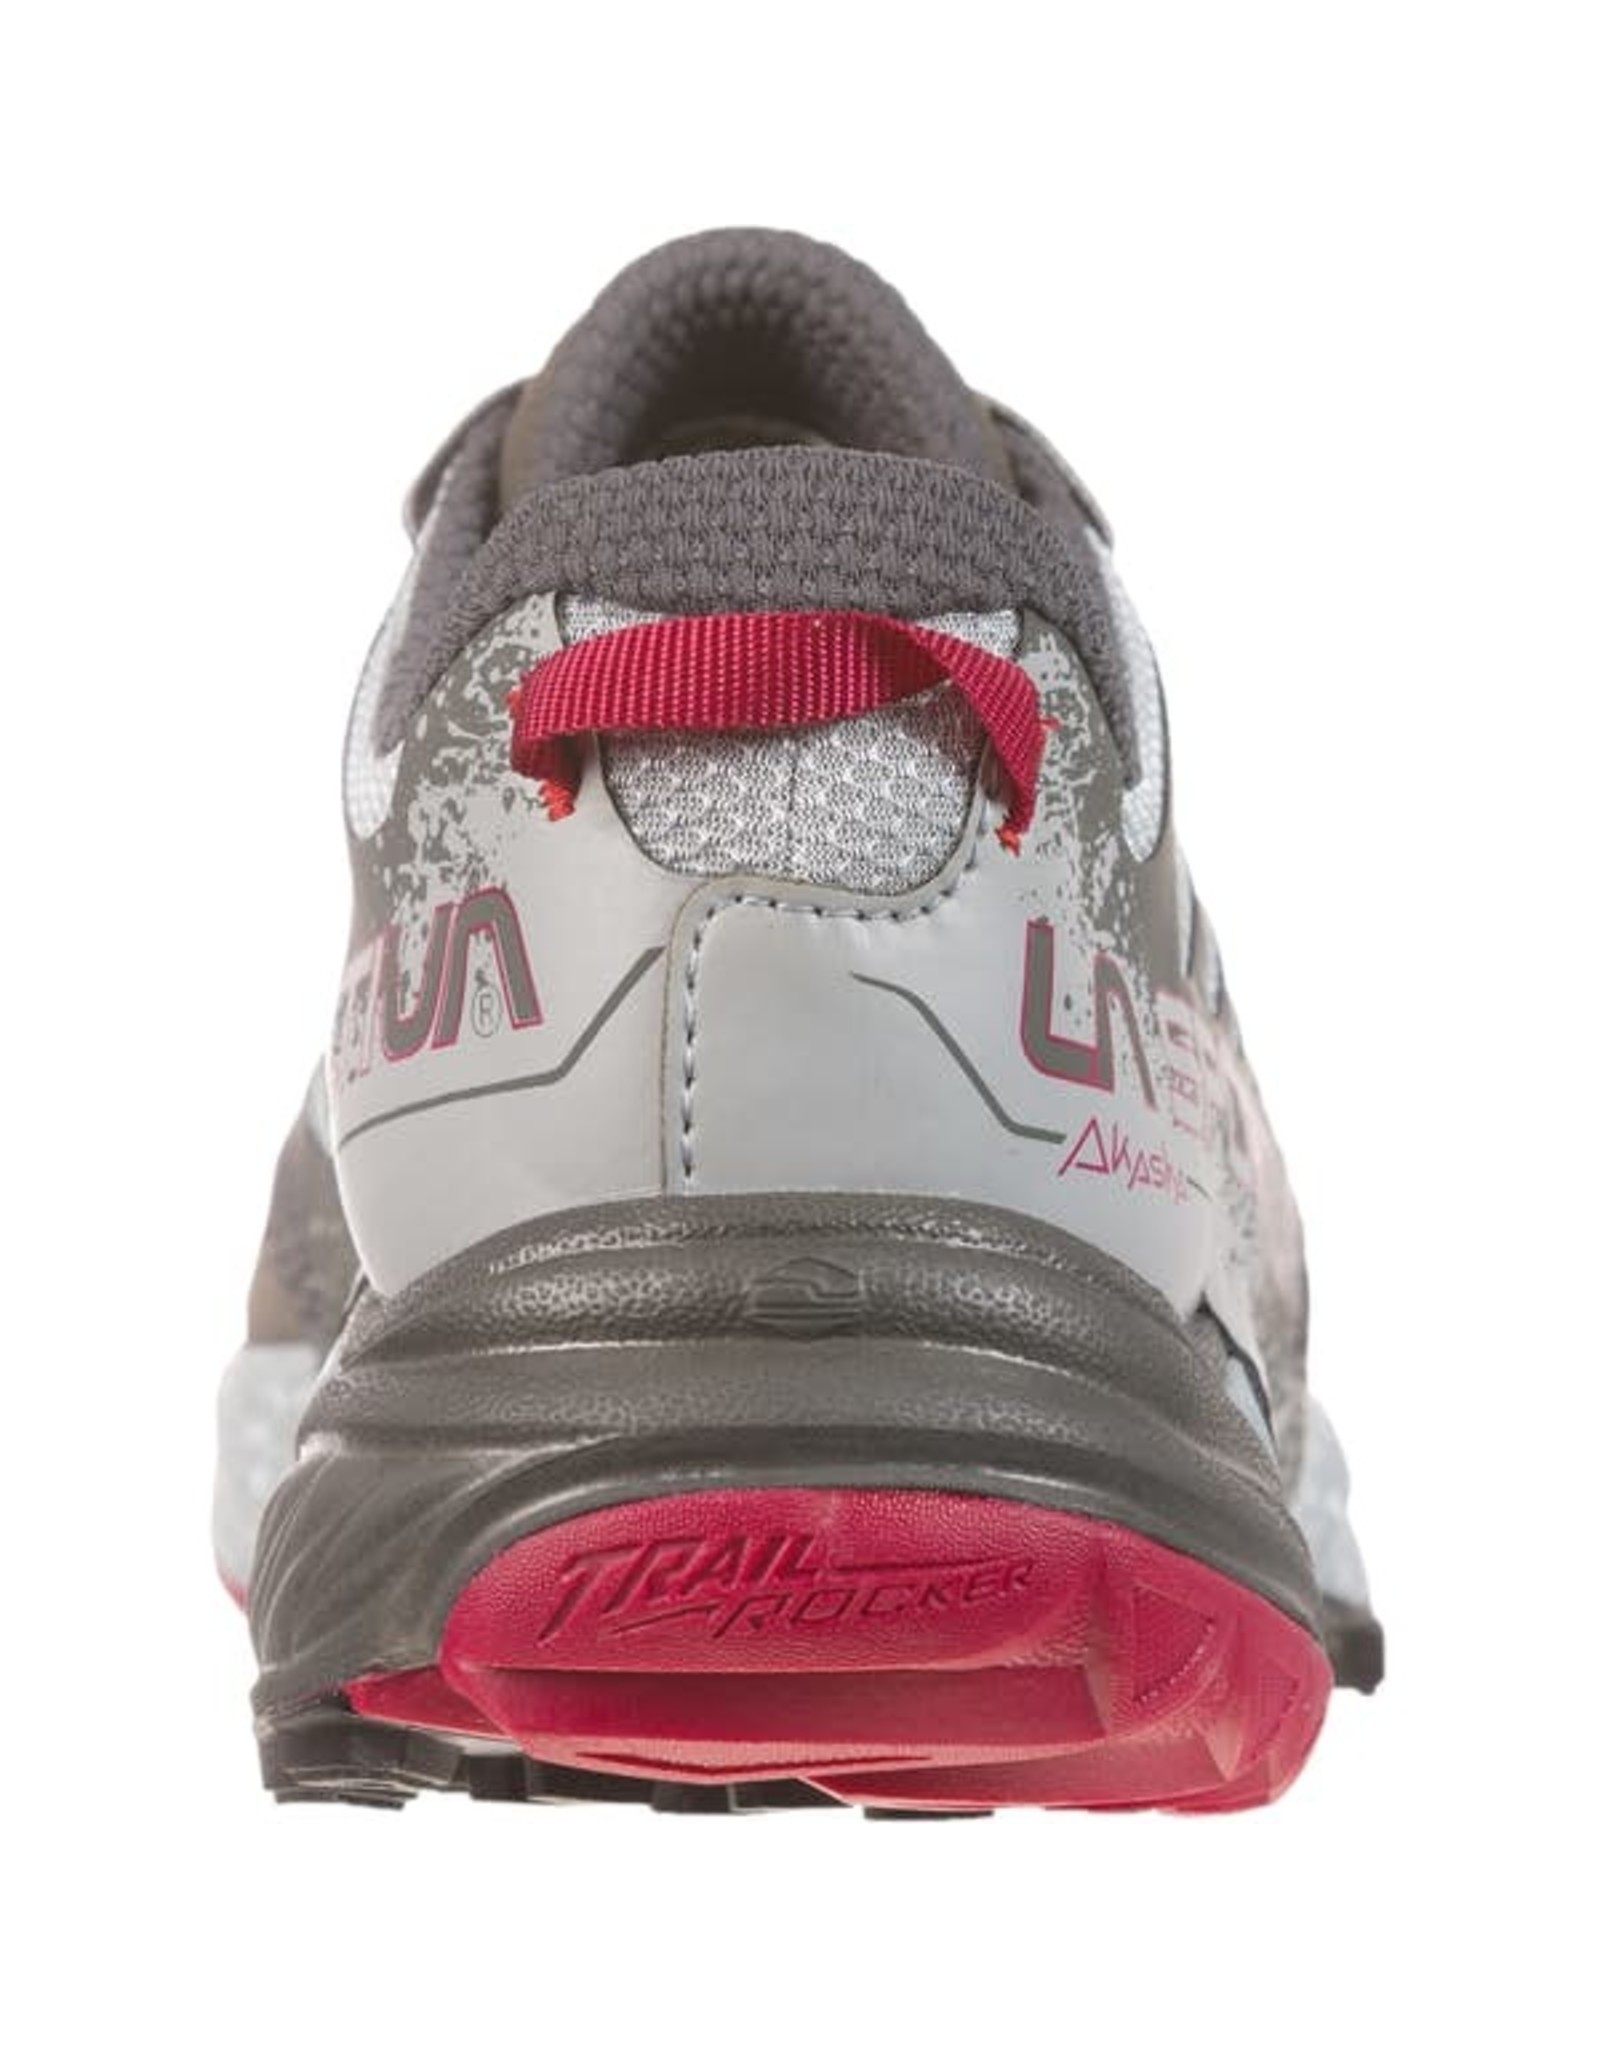 La Sportiva La Sportiva Women's Akasha Running Shoes